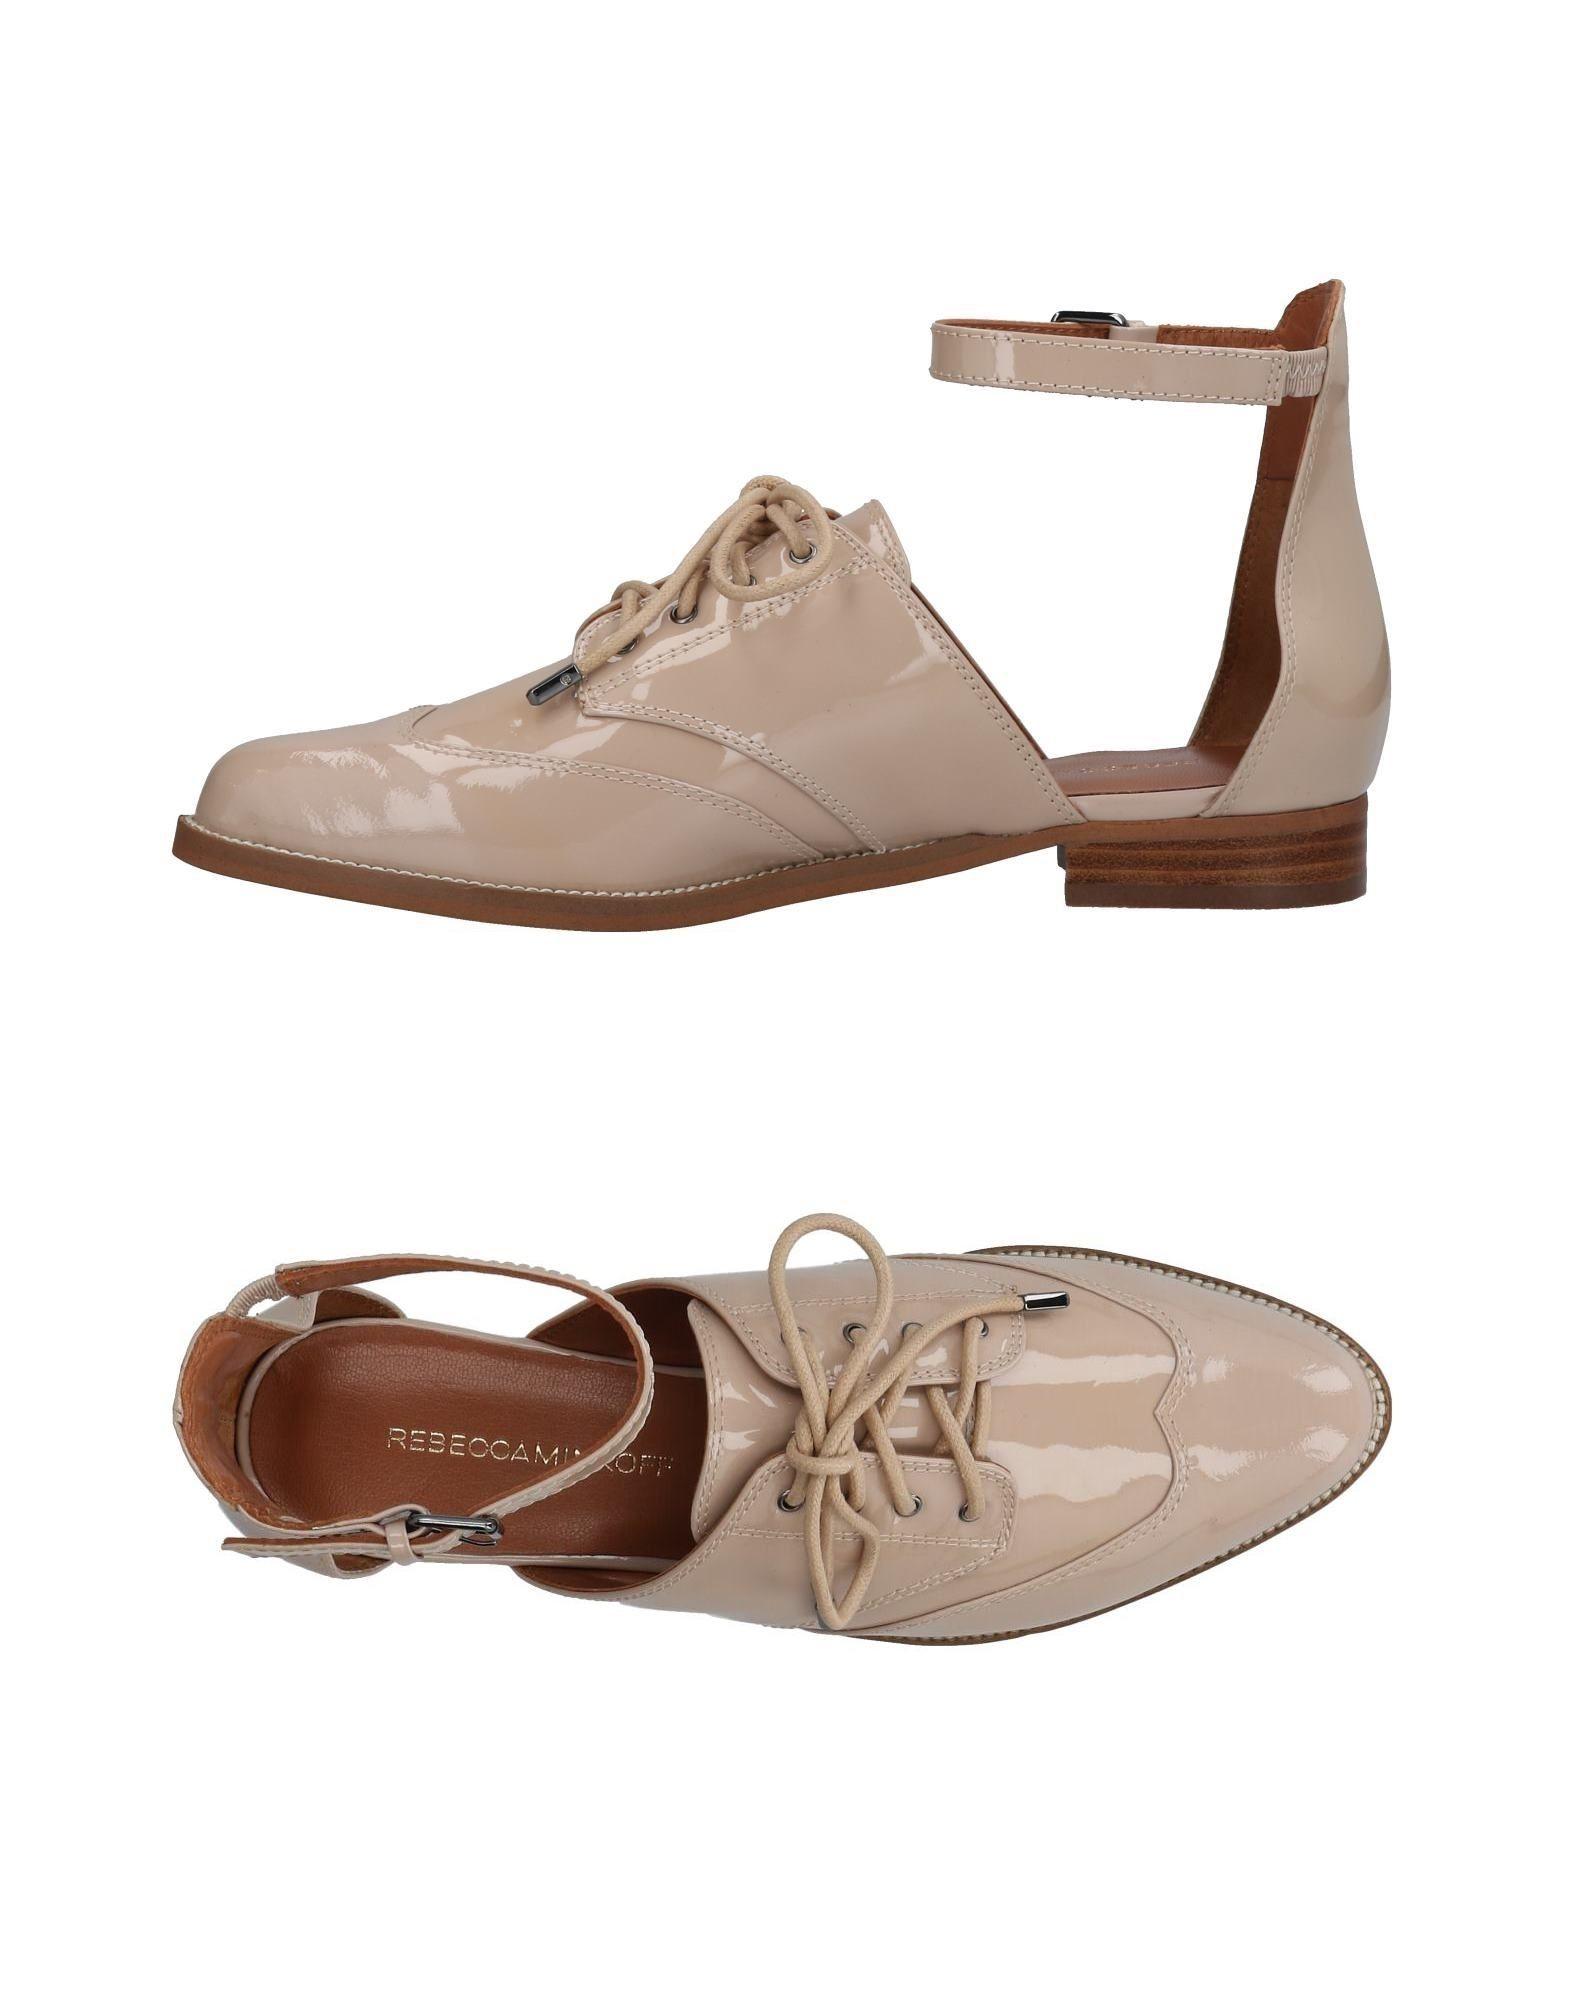 CHAUSSURES - Chaussures à lacetsRebecca Minkoff XXekL7f8